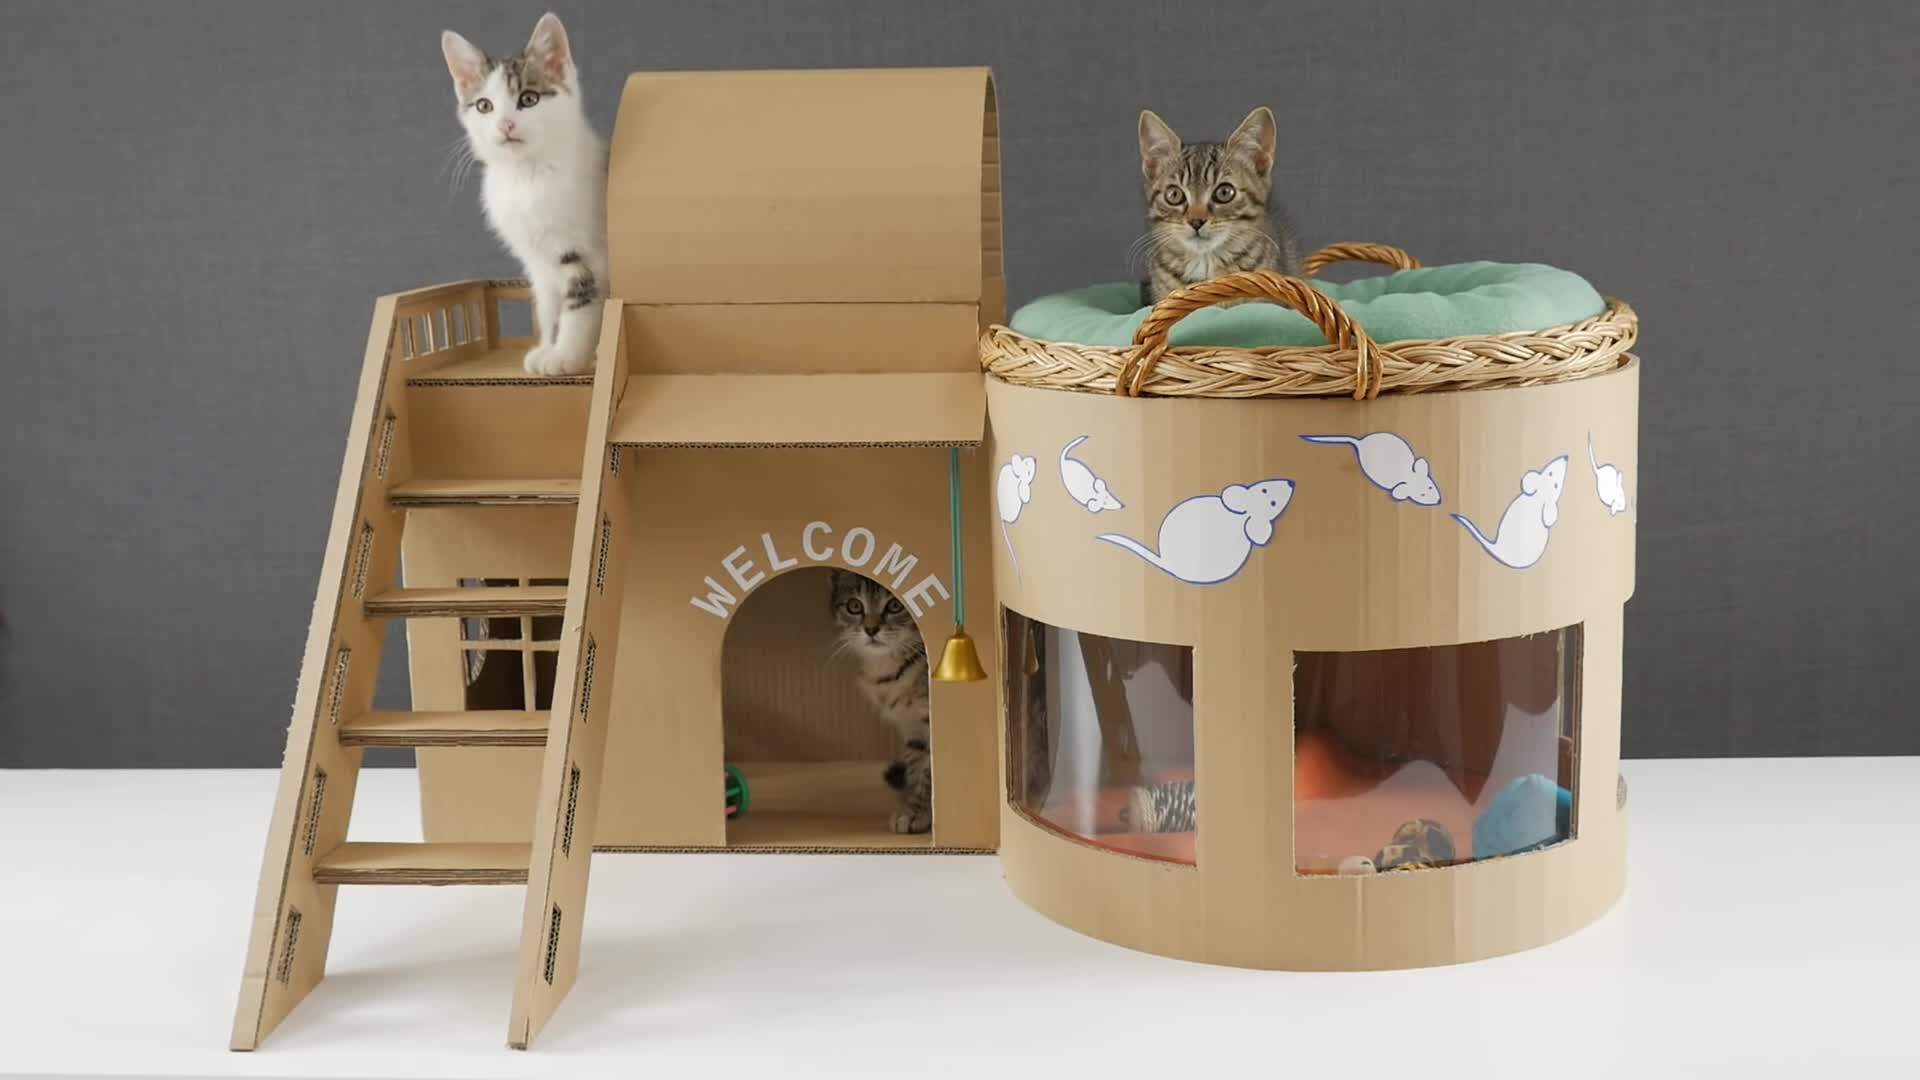 Домики для котов своими руками фото из коробок фото 39